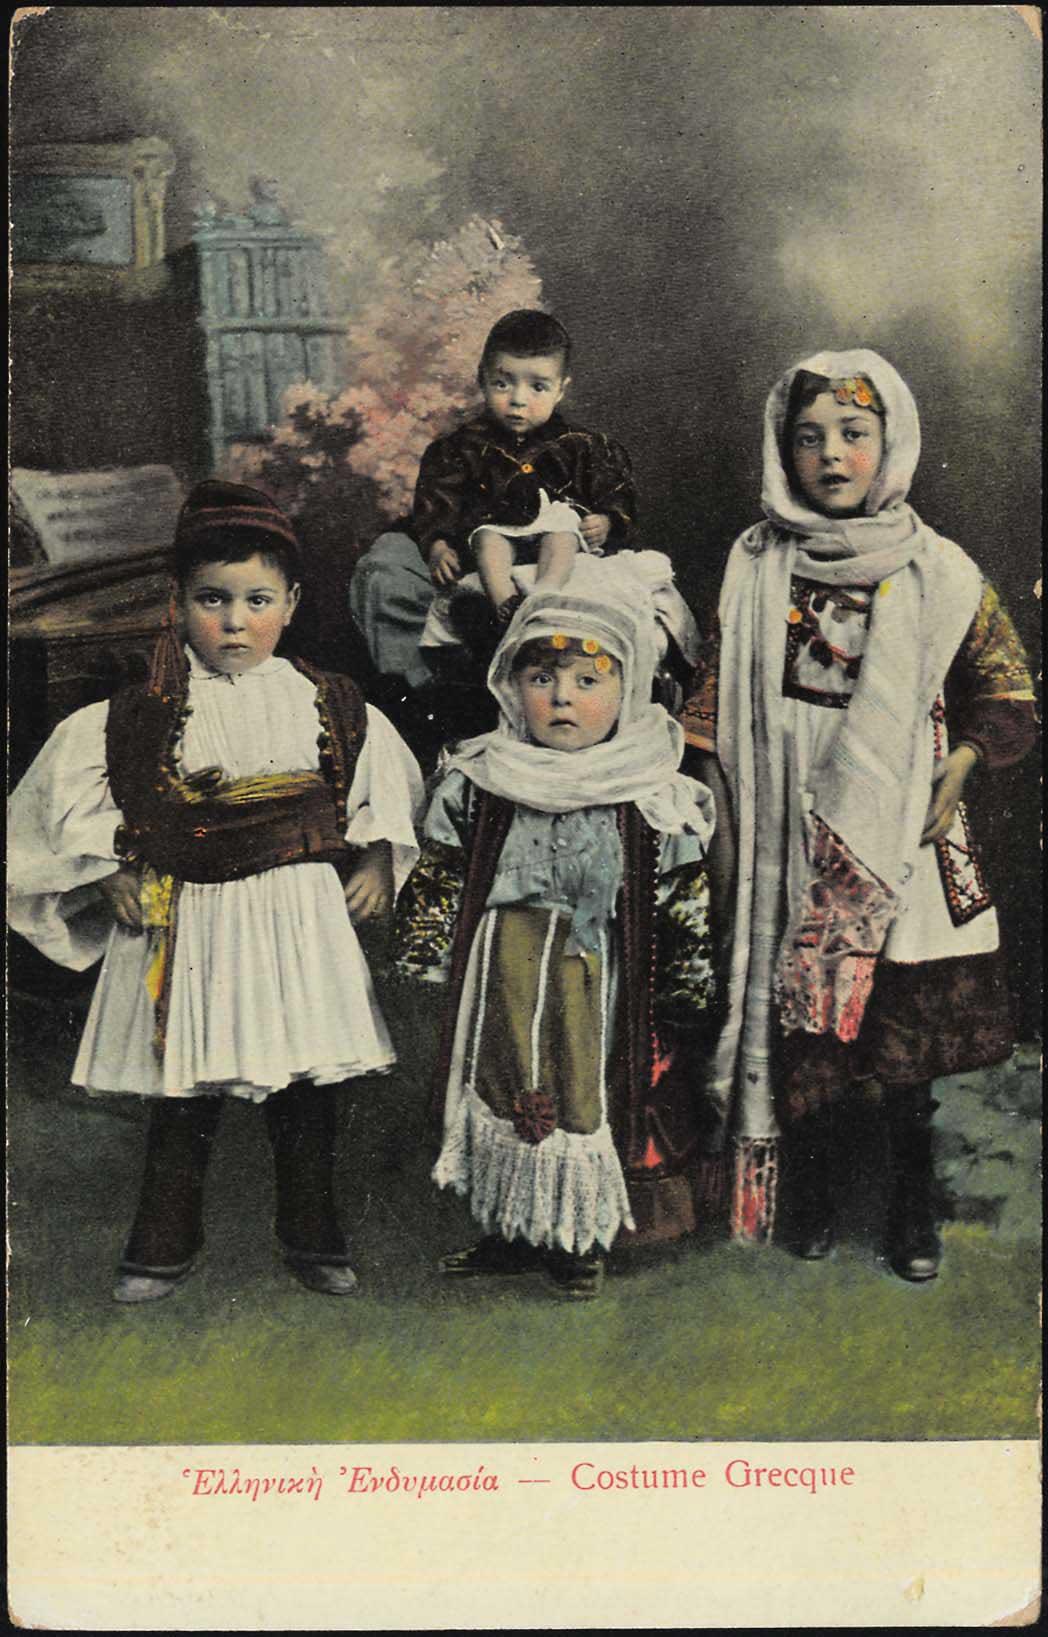 Lot 1596 - -  PICTURE POSTCARDS costumes -  A. Karamitsos Postal & Live Internet Auction 681 General Philatelic Auction